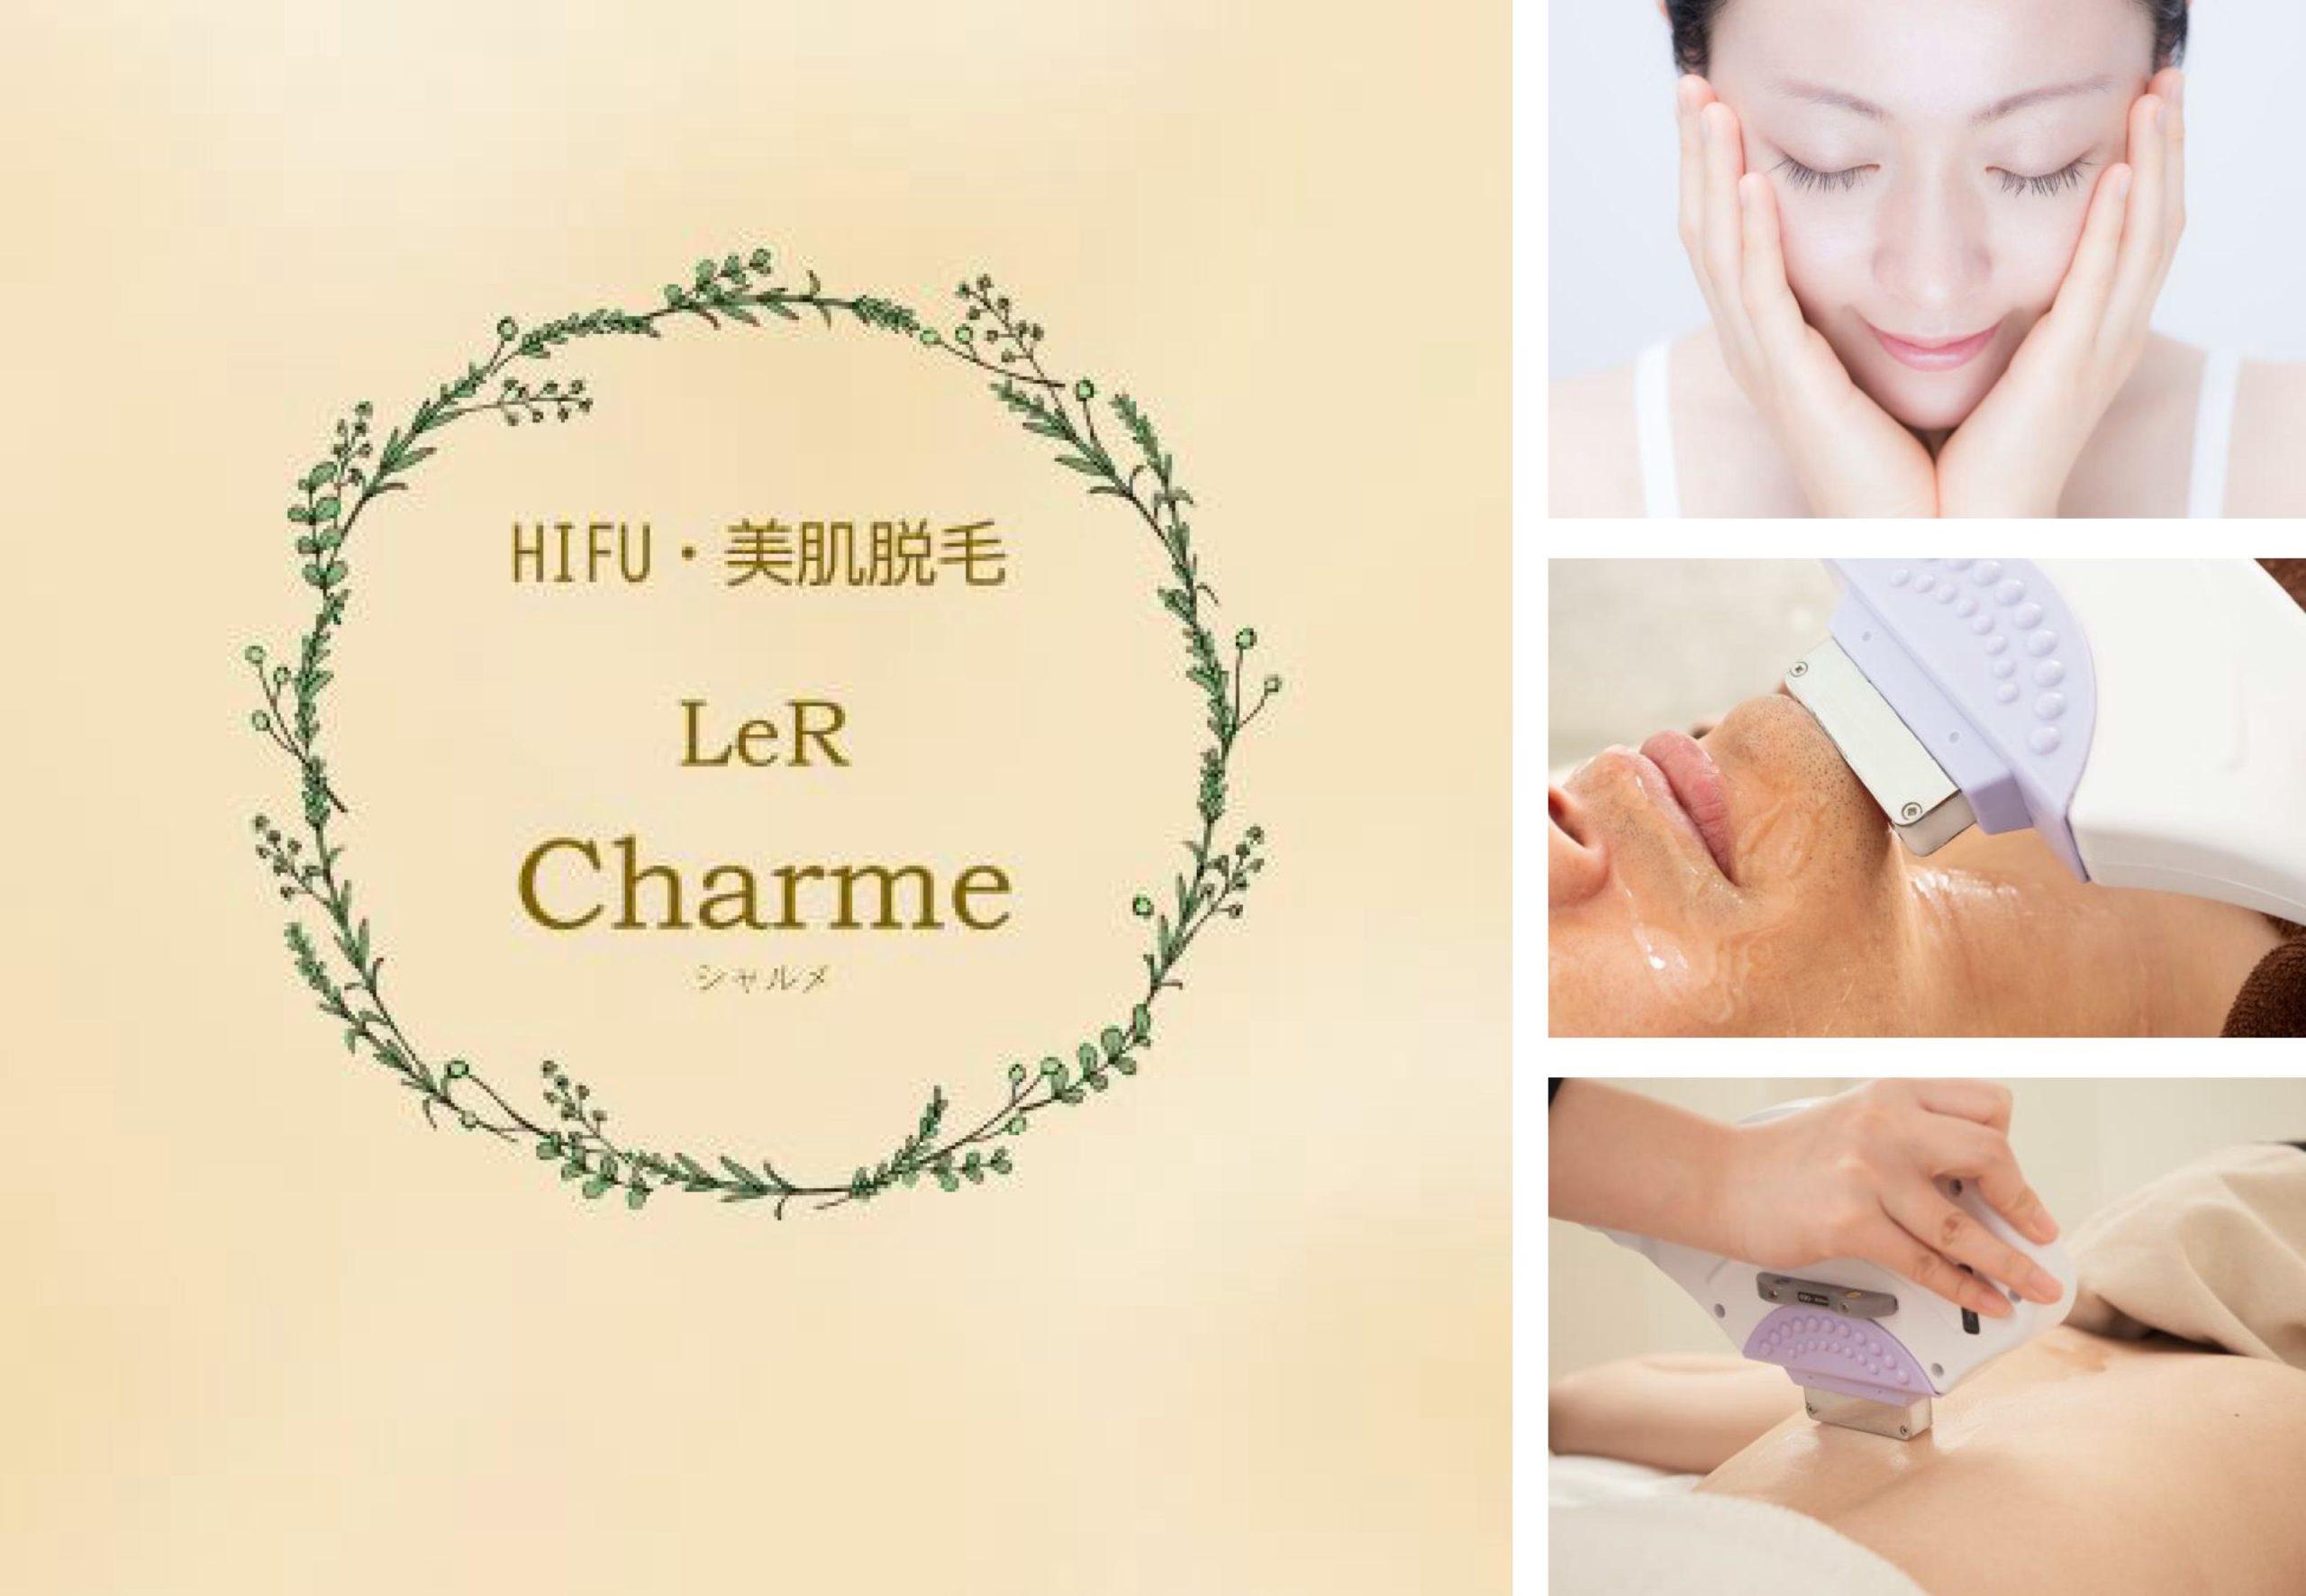 『HIFU &美肌脱毛&メンズ脱毛のお店 LeR Charme オープン』